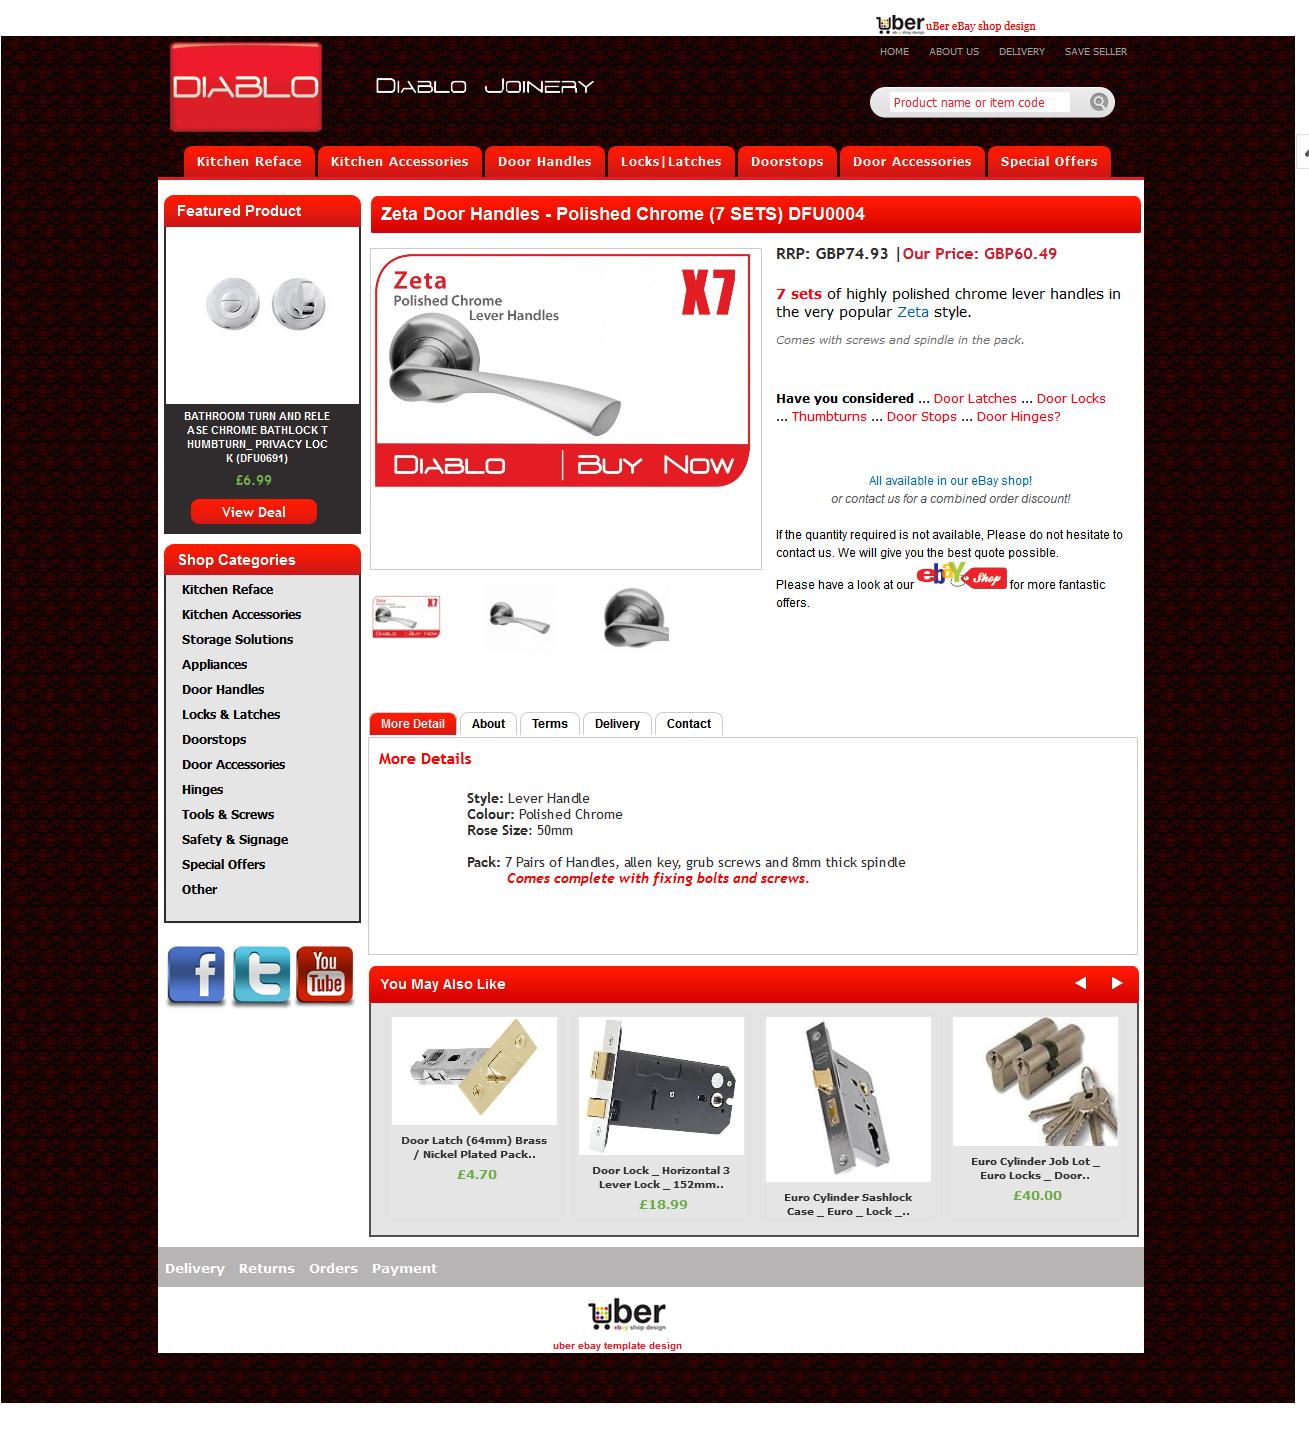 Diablo Joinery ebay item page design